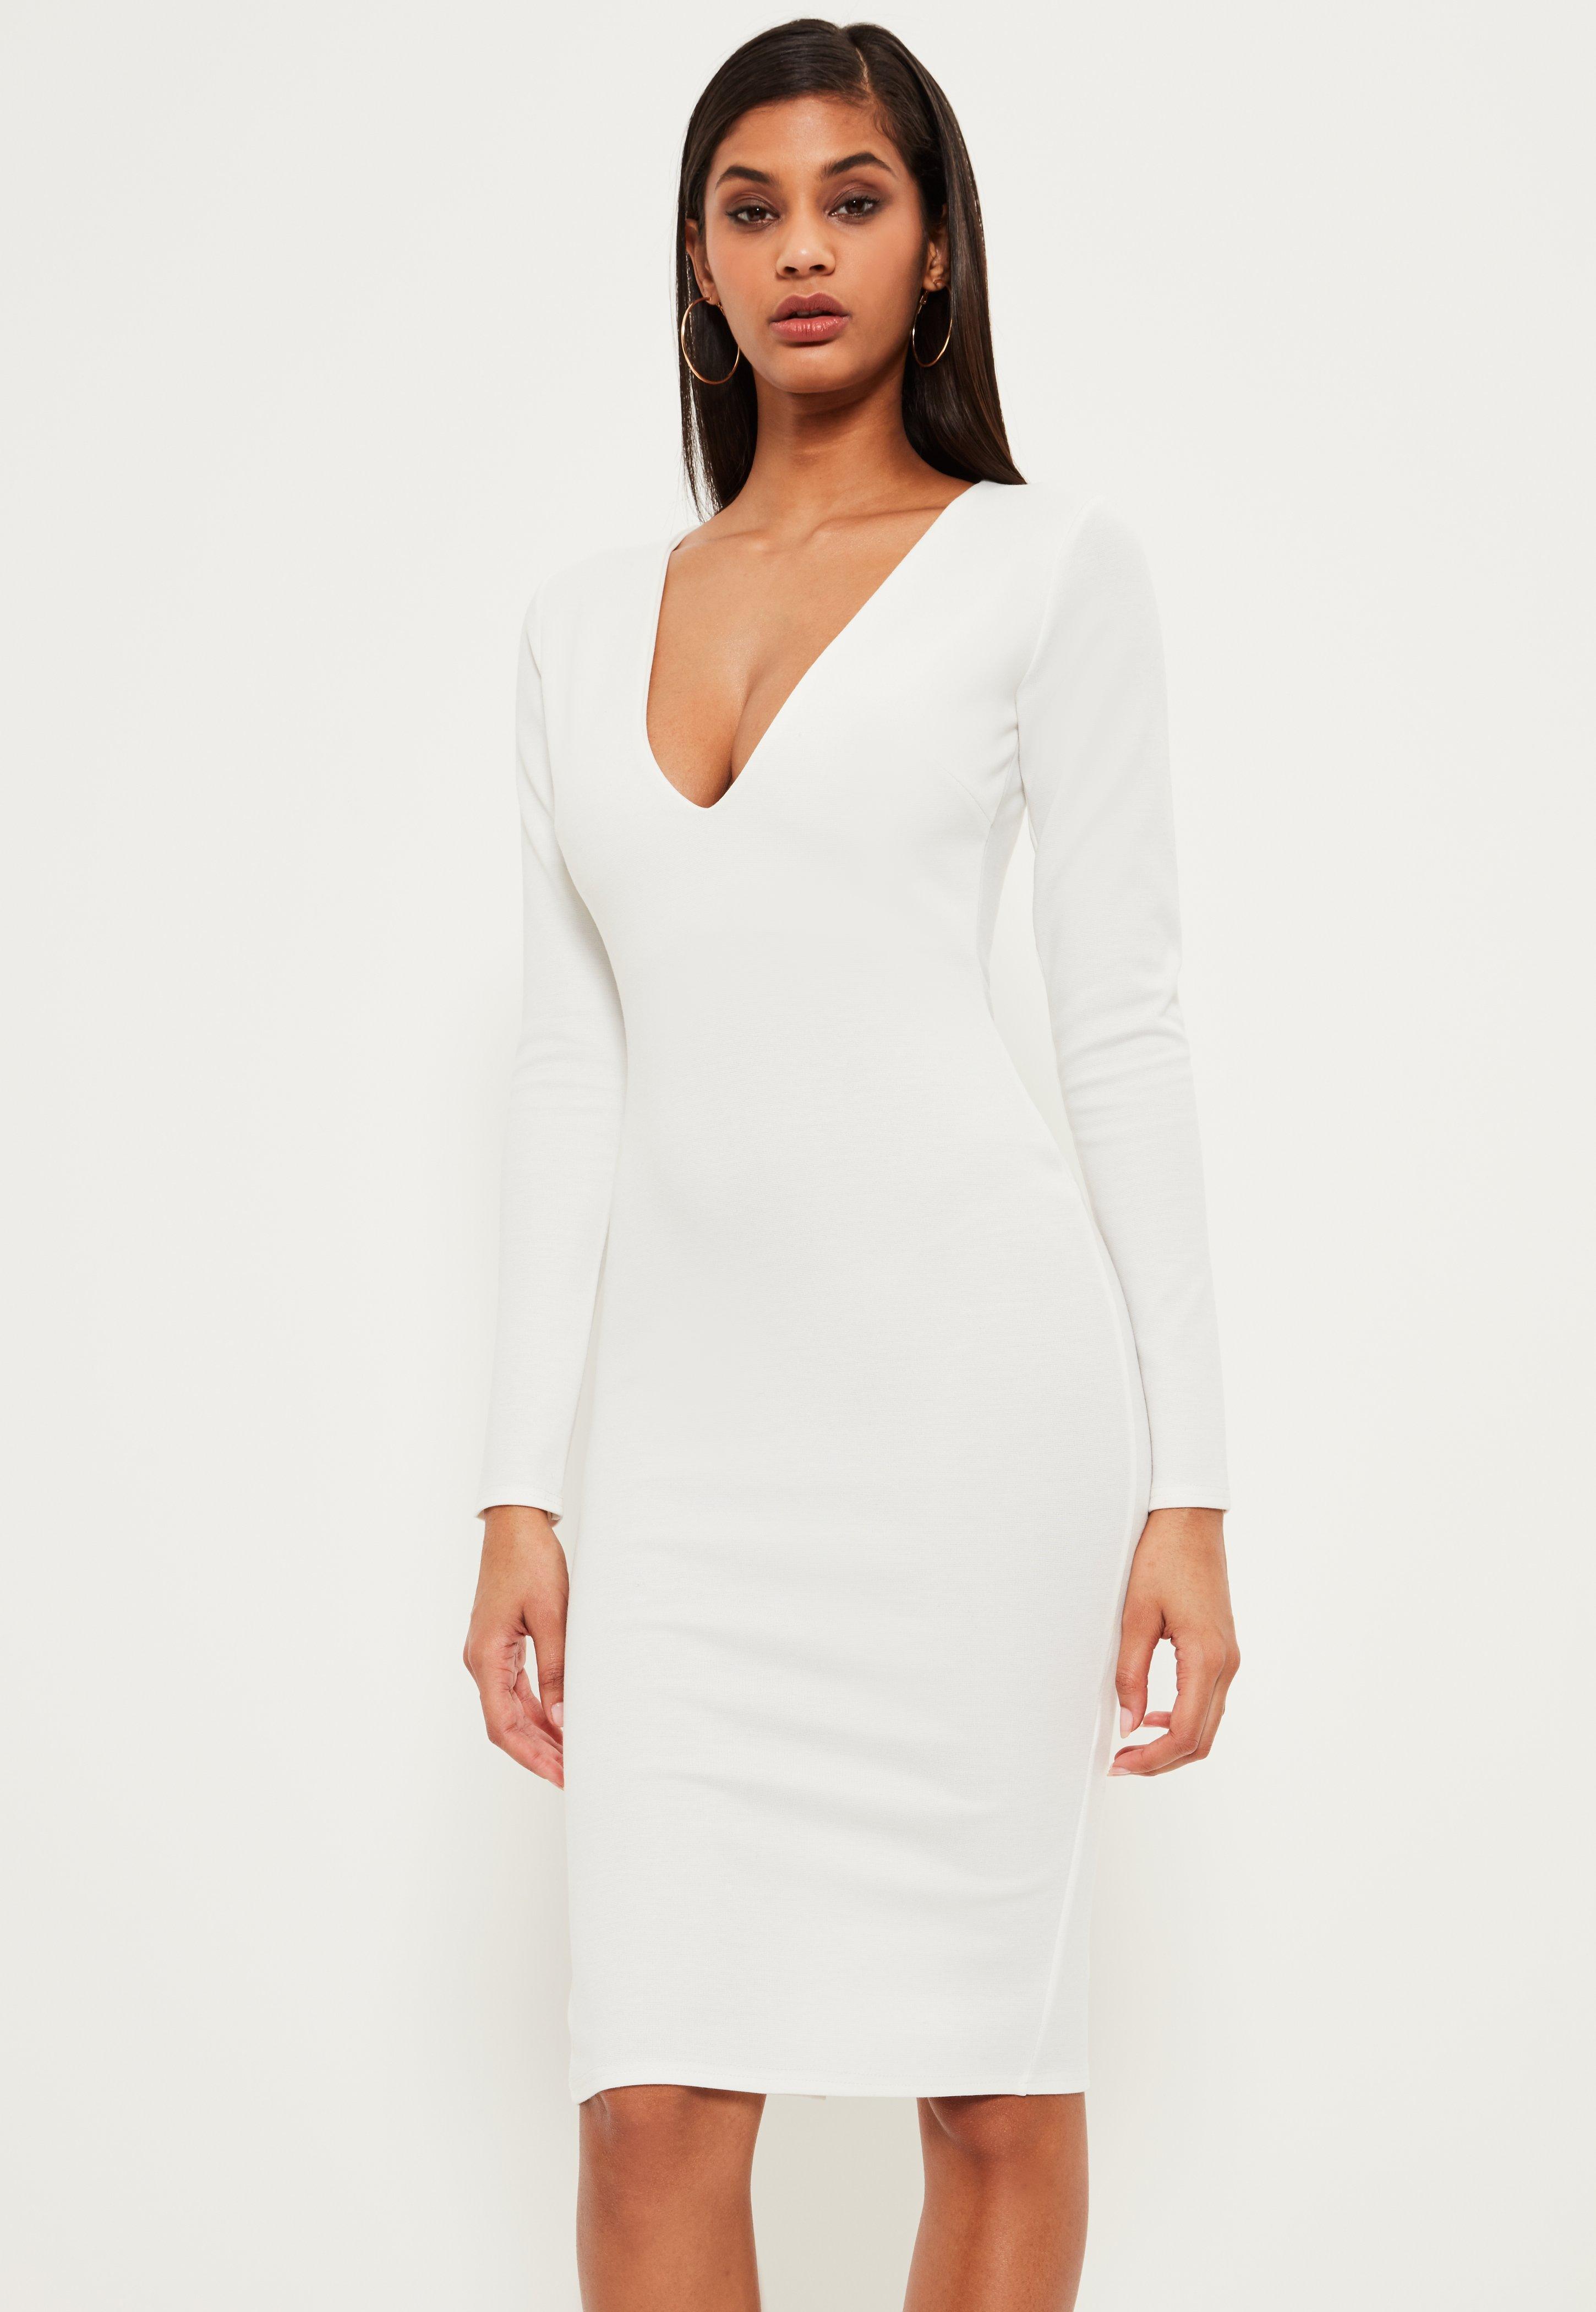 Robe blanche droite sans manche